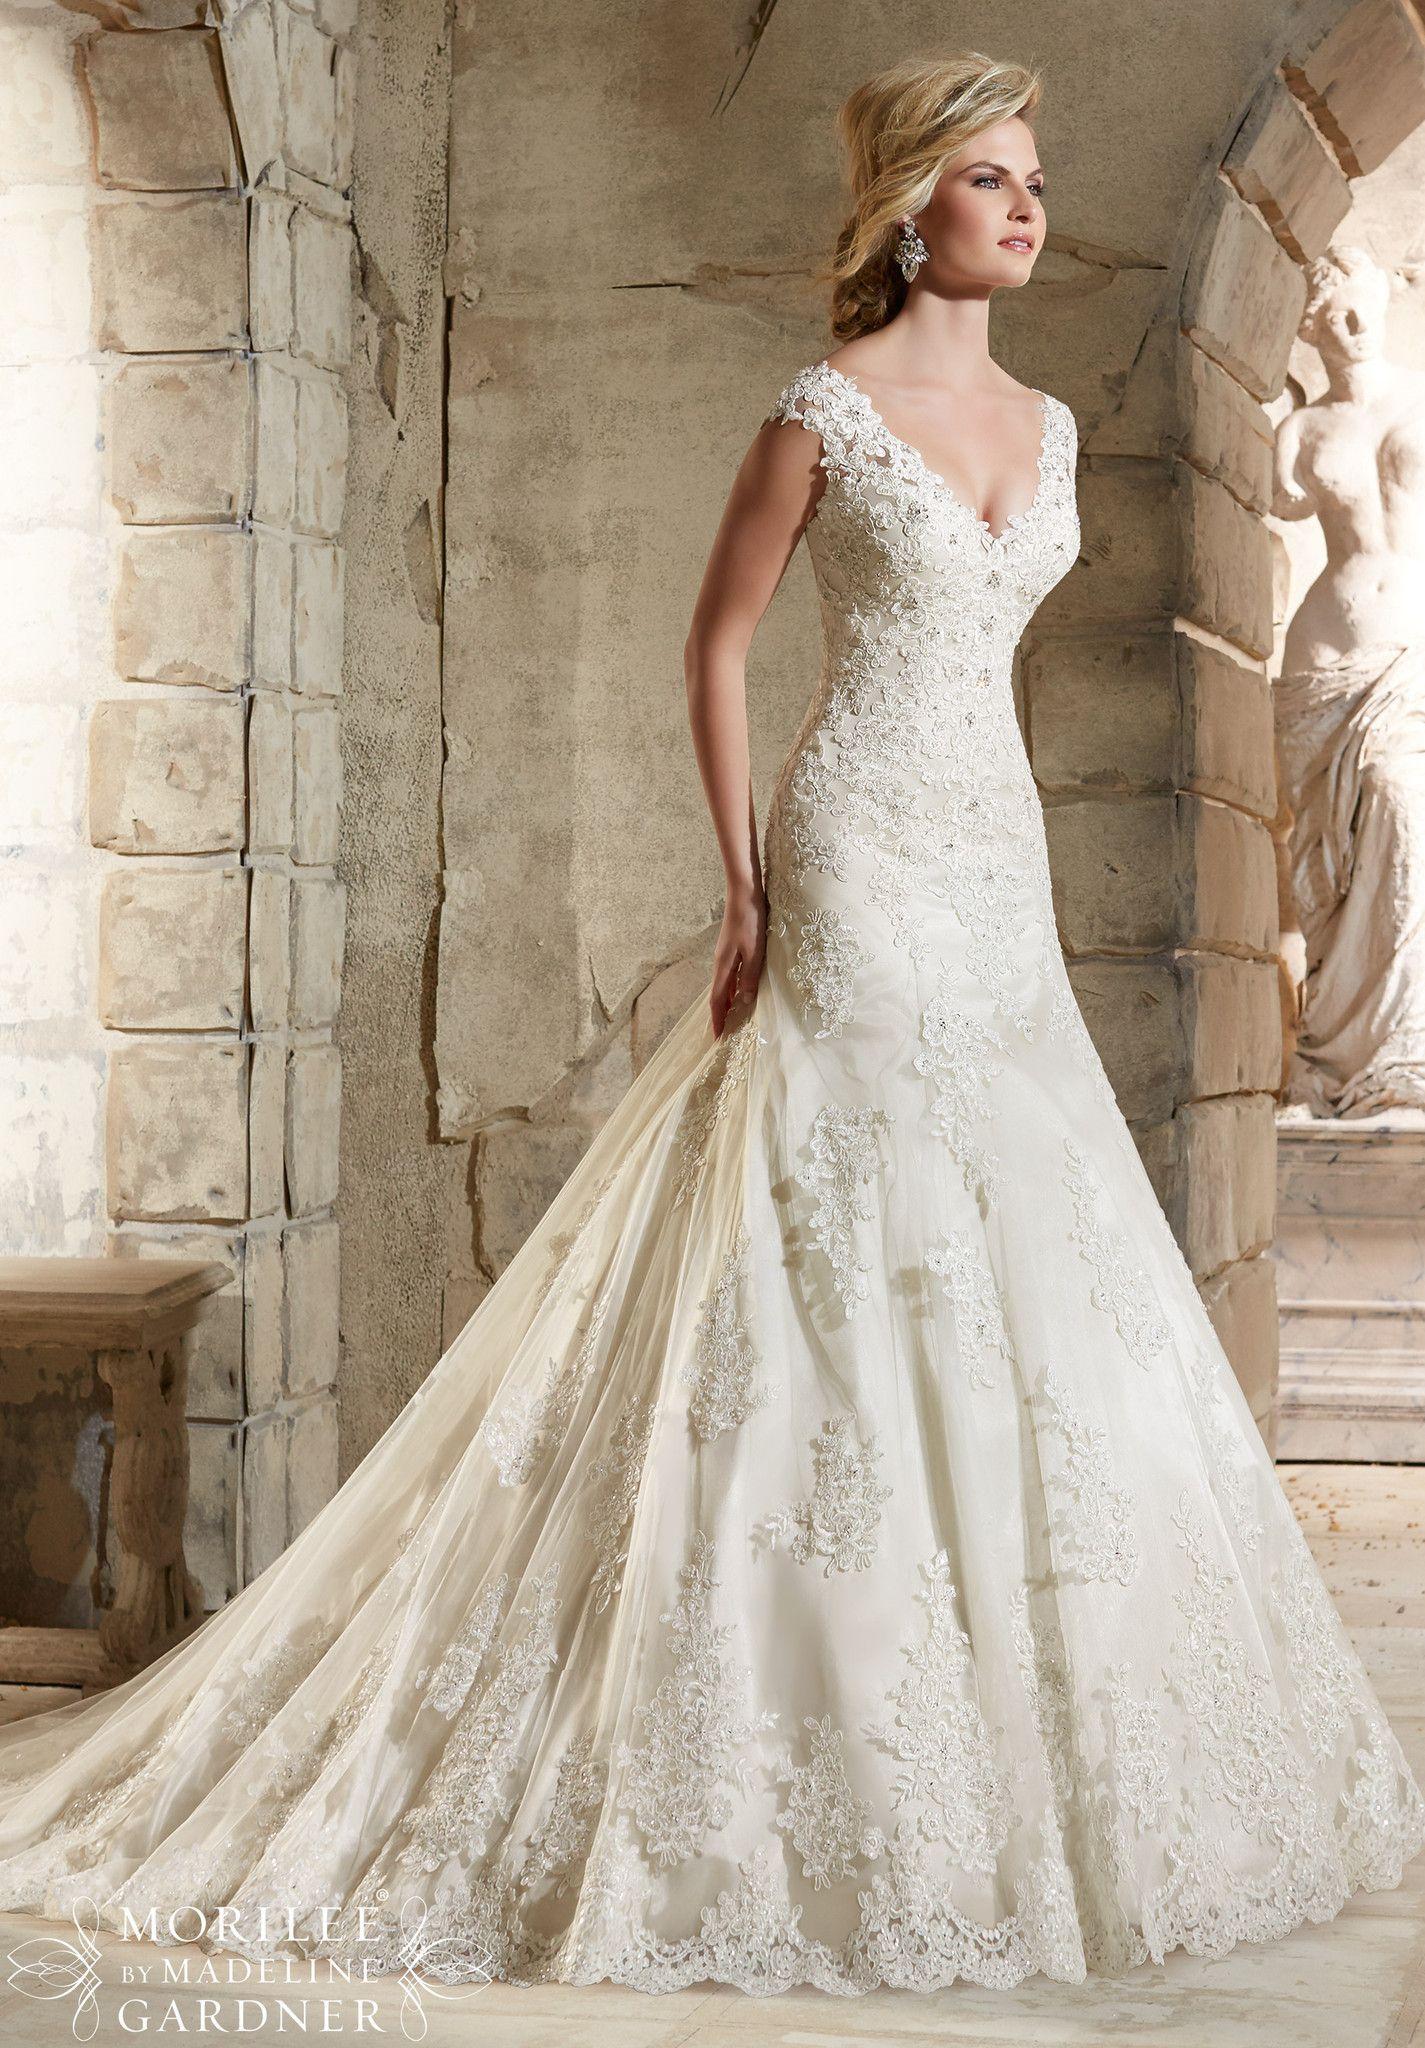 Mori Lee Marni 5572 Wedding Dress Wedding Dress Sale Price 1275 Mori Lee Wedding Dress Wedding Dresses Fit And Flare Wedding Dress